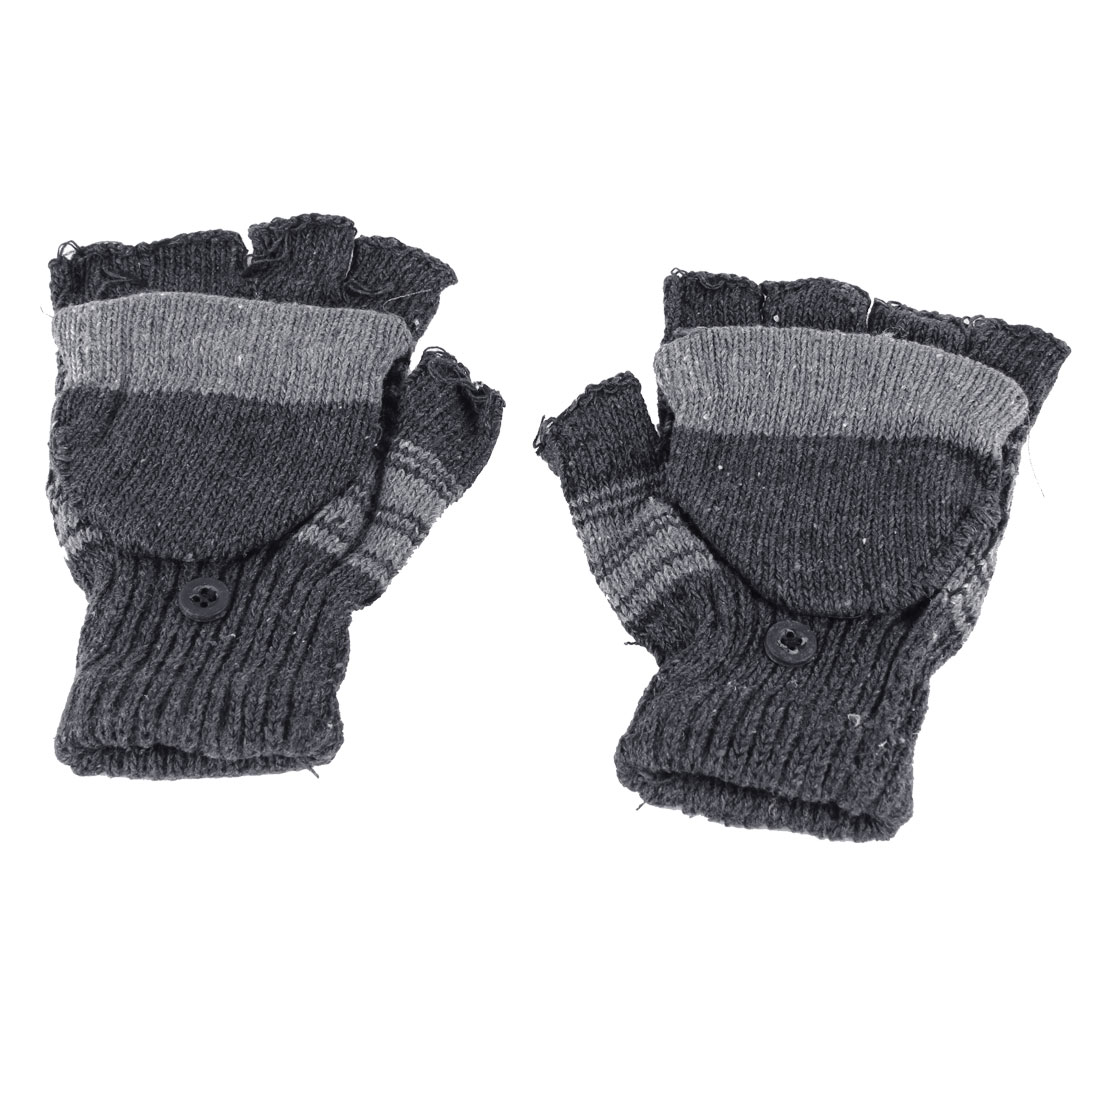 Boys Pair Hand Knitting Convertible Mitten Cover Fingerless Gloves Gray